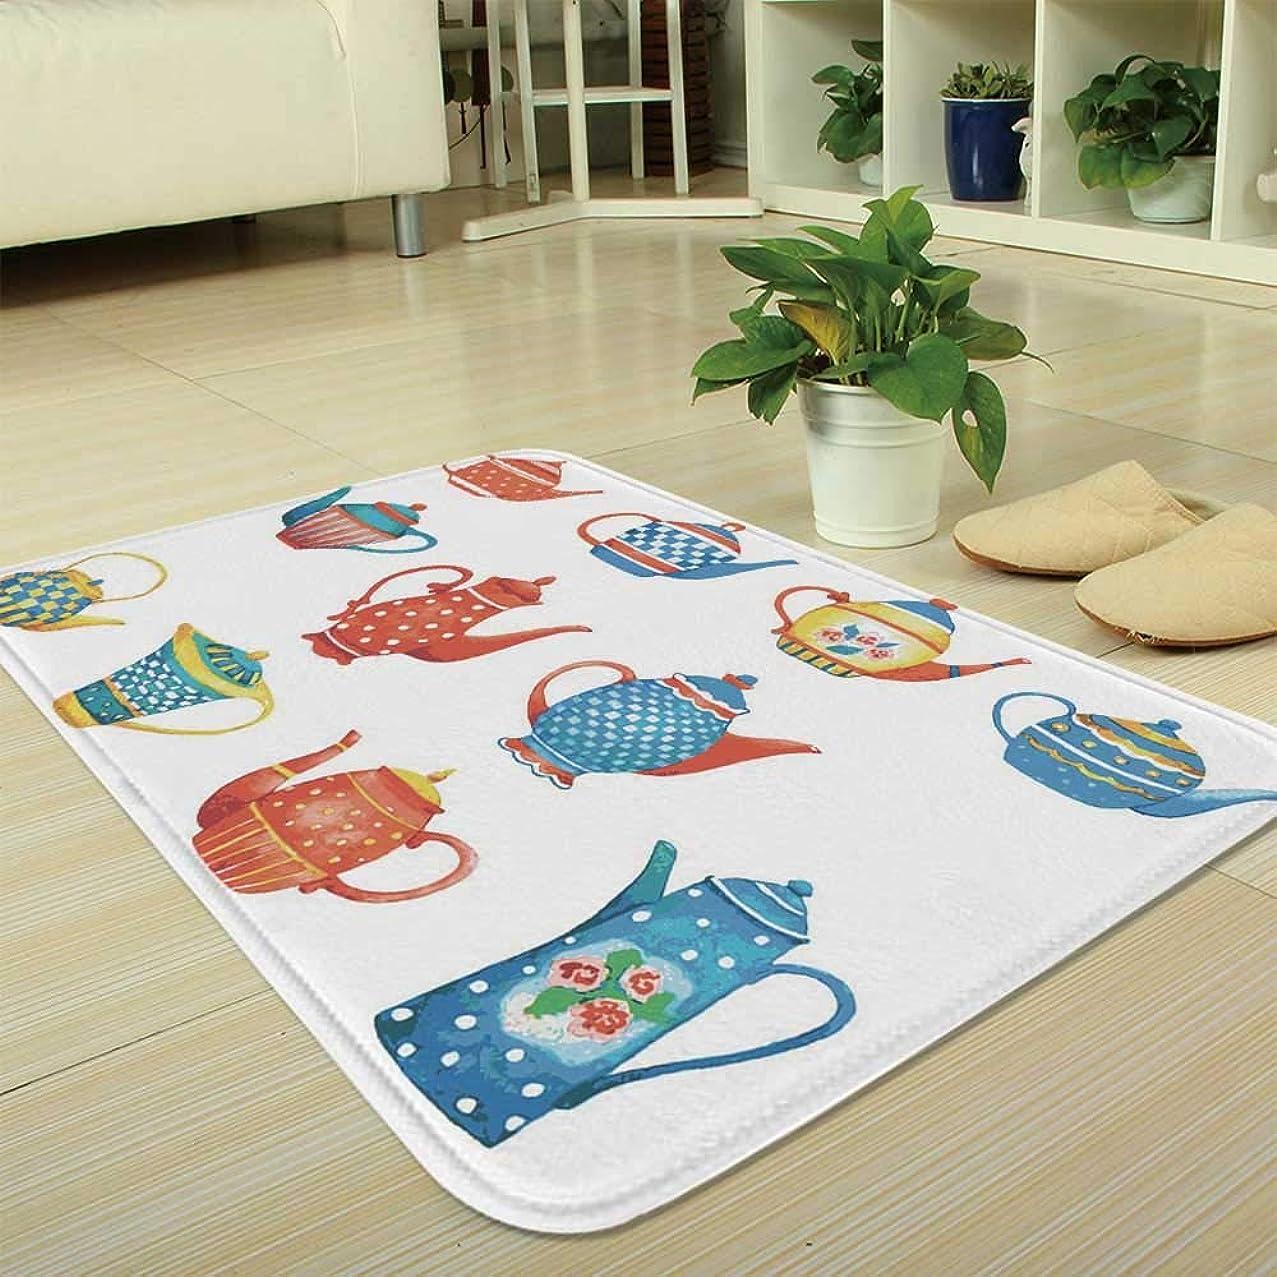 Short Fur Floor Mat,Tea Party,for Home Meeting Room,35.43